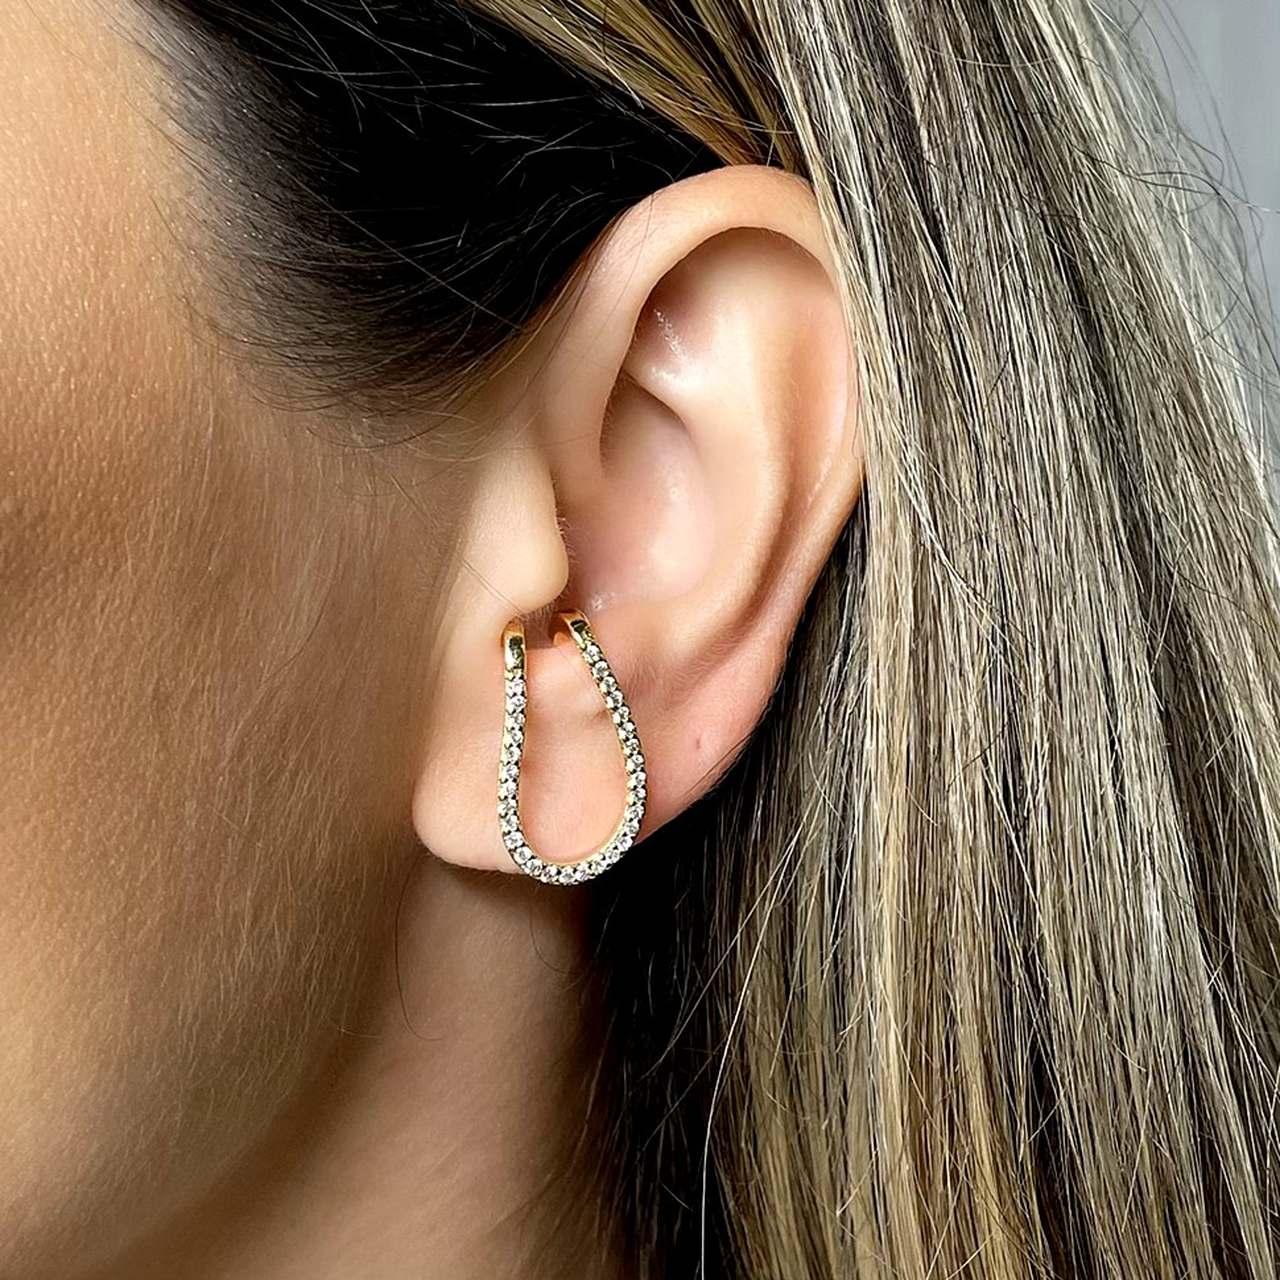 Ear Hook Formato U Cravejado Banho Ouro